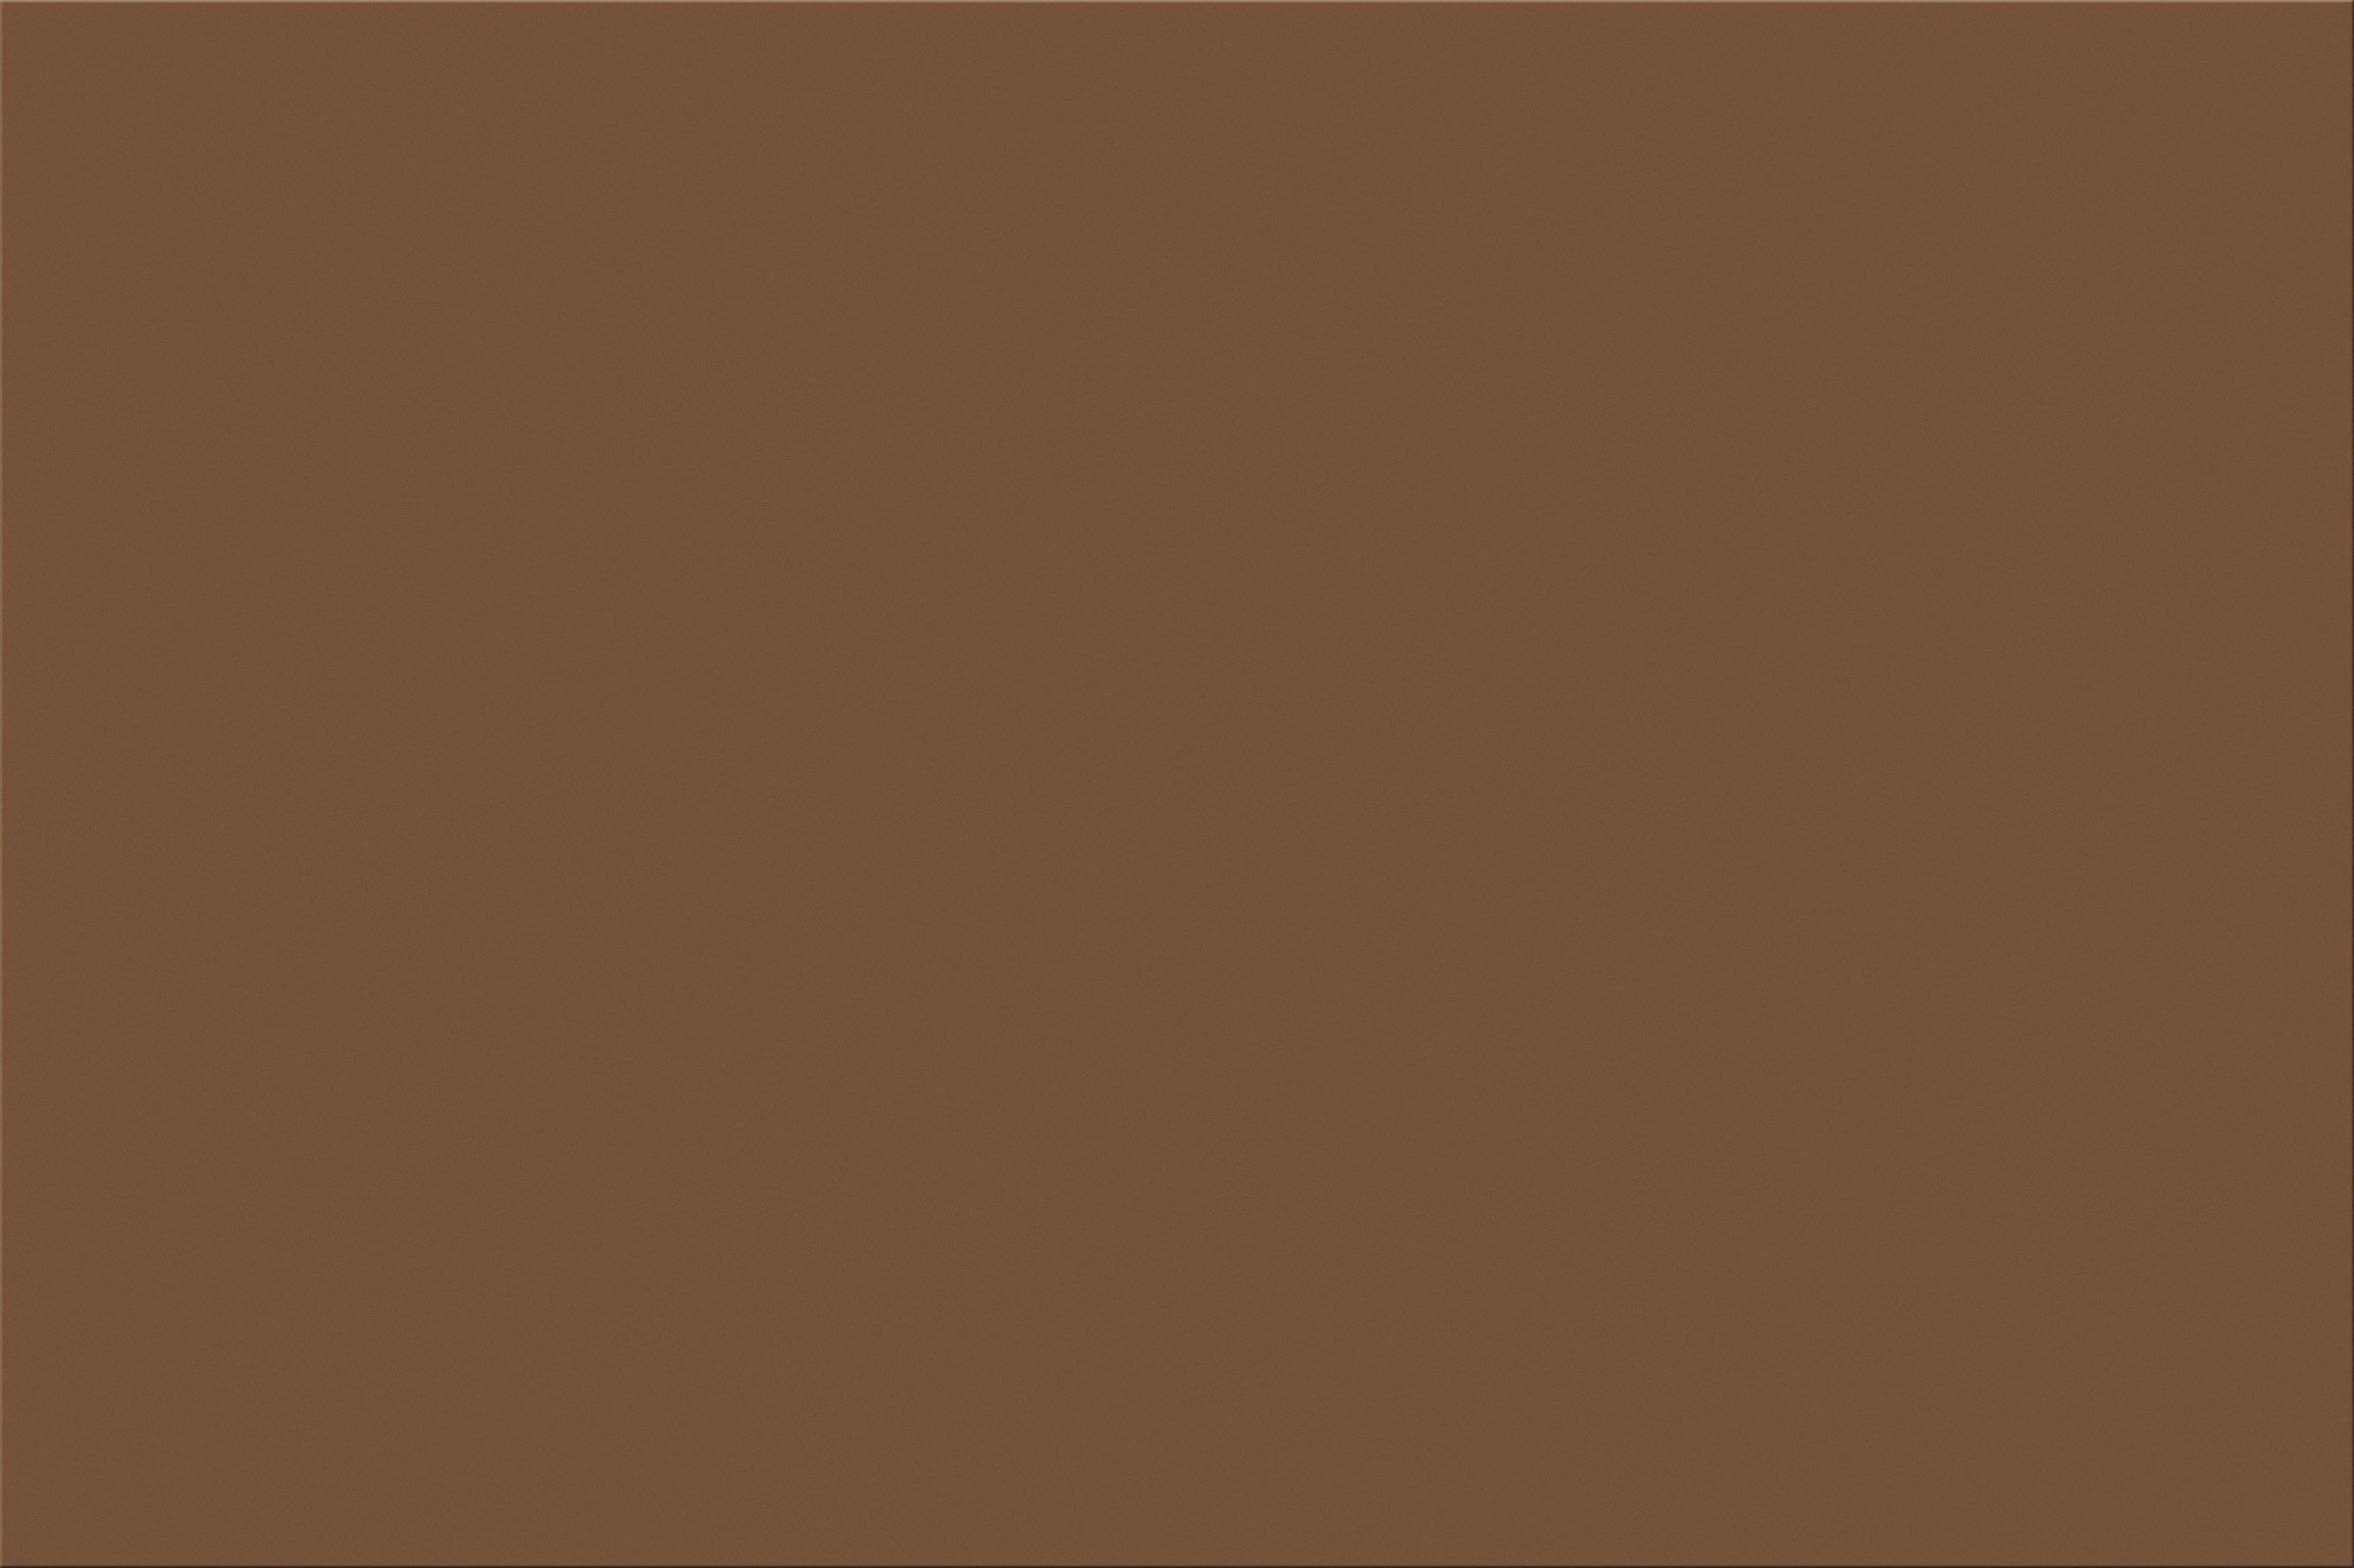 Pacon SunWorks Construction Paper, 12'' x 18'', 100-Count, Dark Brown (6808)